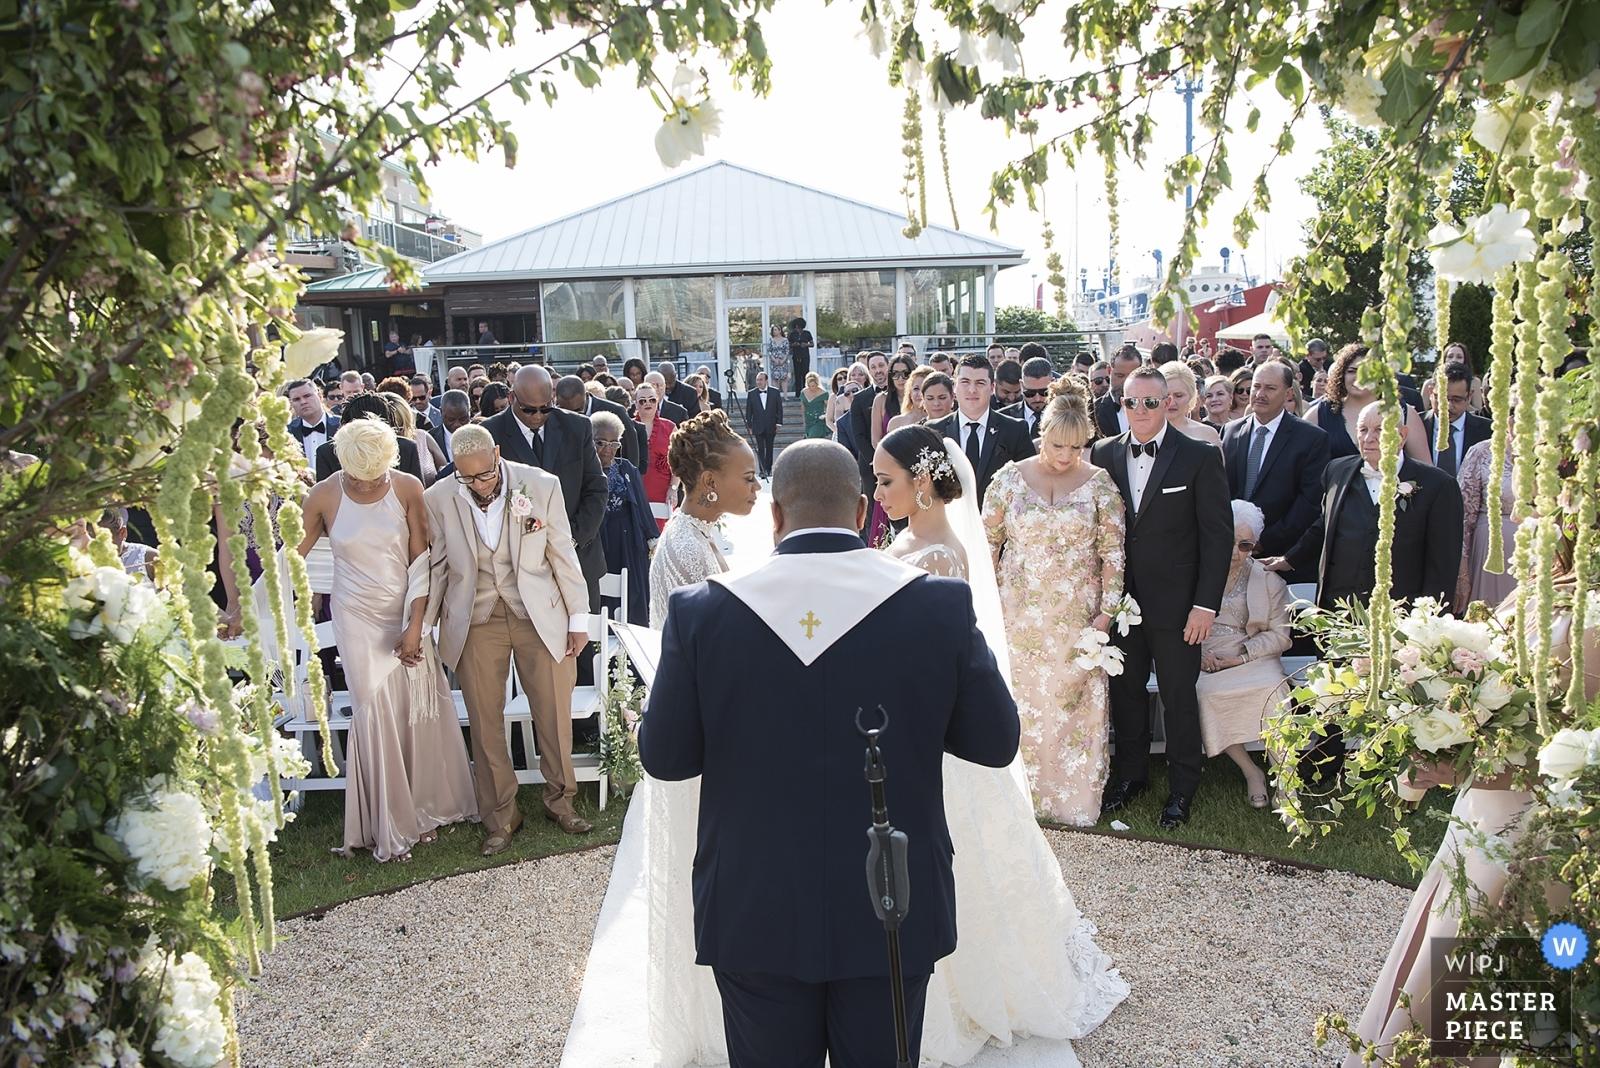 brides during wedding ceremony - Hoboken, New Jersey Wedding Photography -  | Liberty House